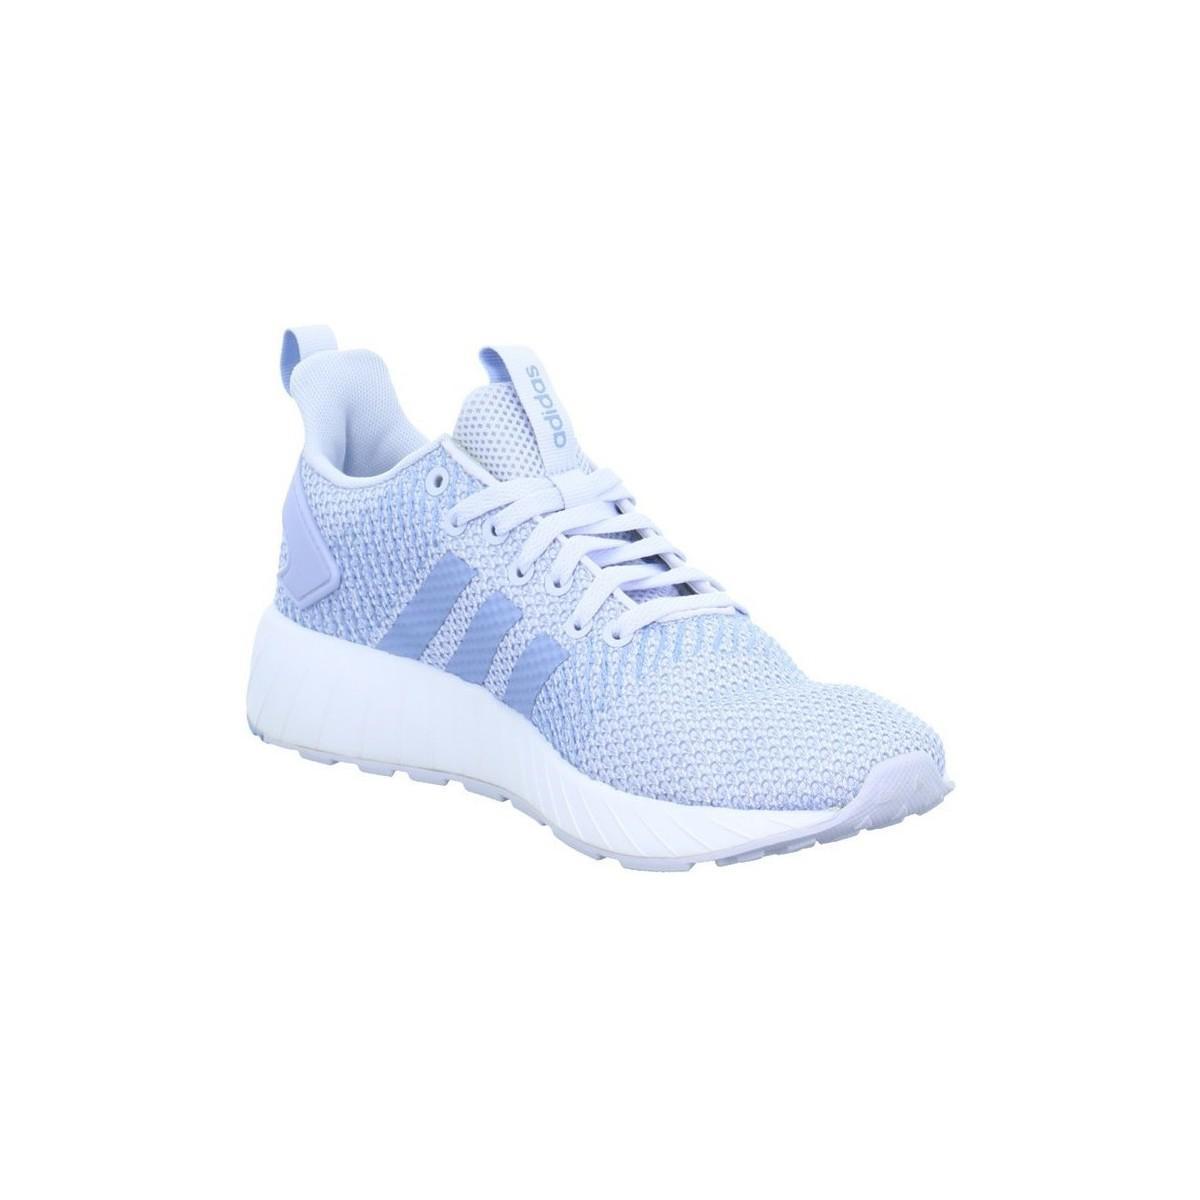 Byd coloris Bleu en W Lyst Questar Chaussures Adidas EOxwqn4RT